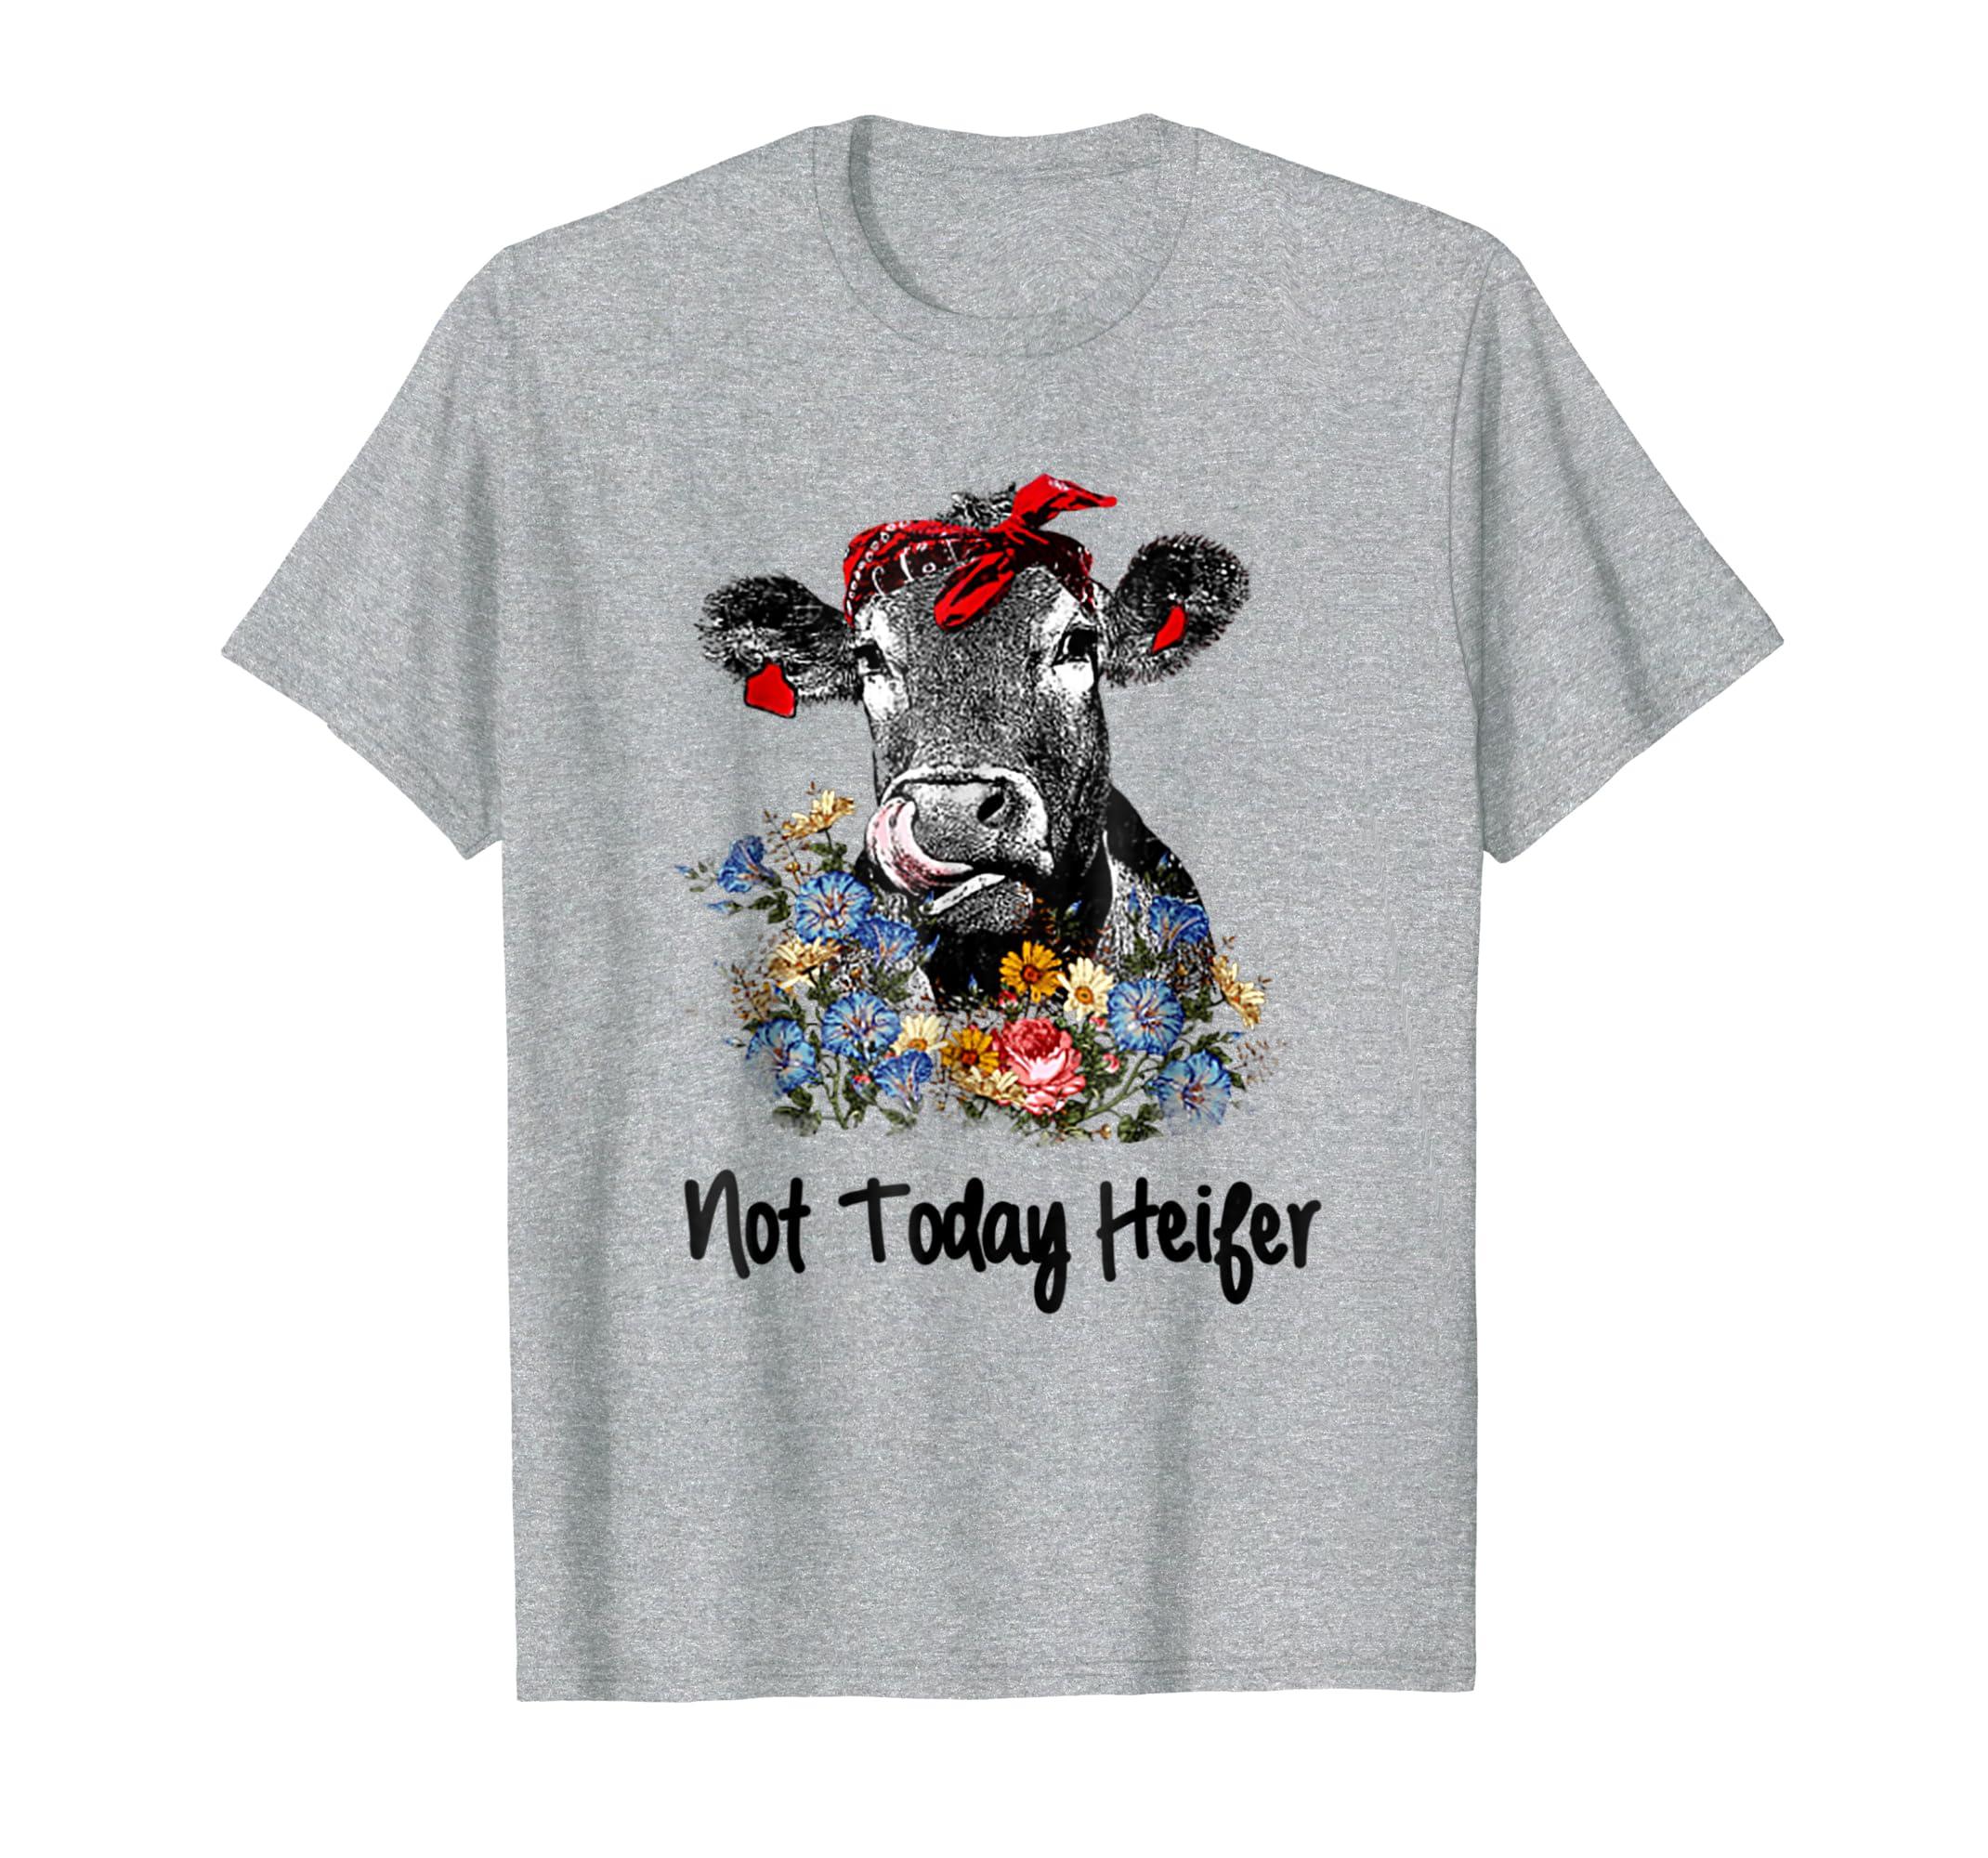 8ee145469 Amazon.com: Not today Heifer shirt: Clothing